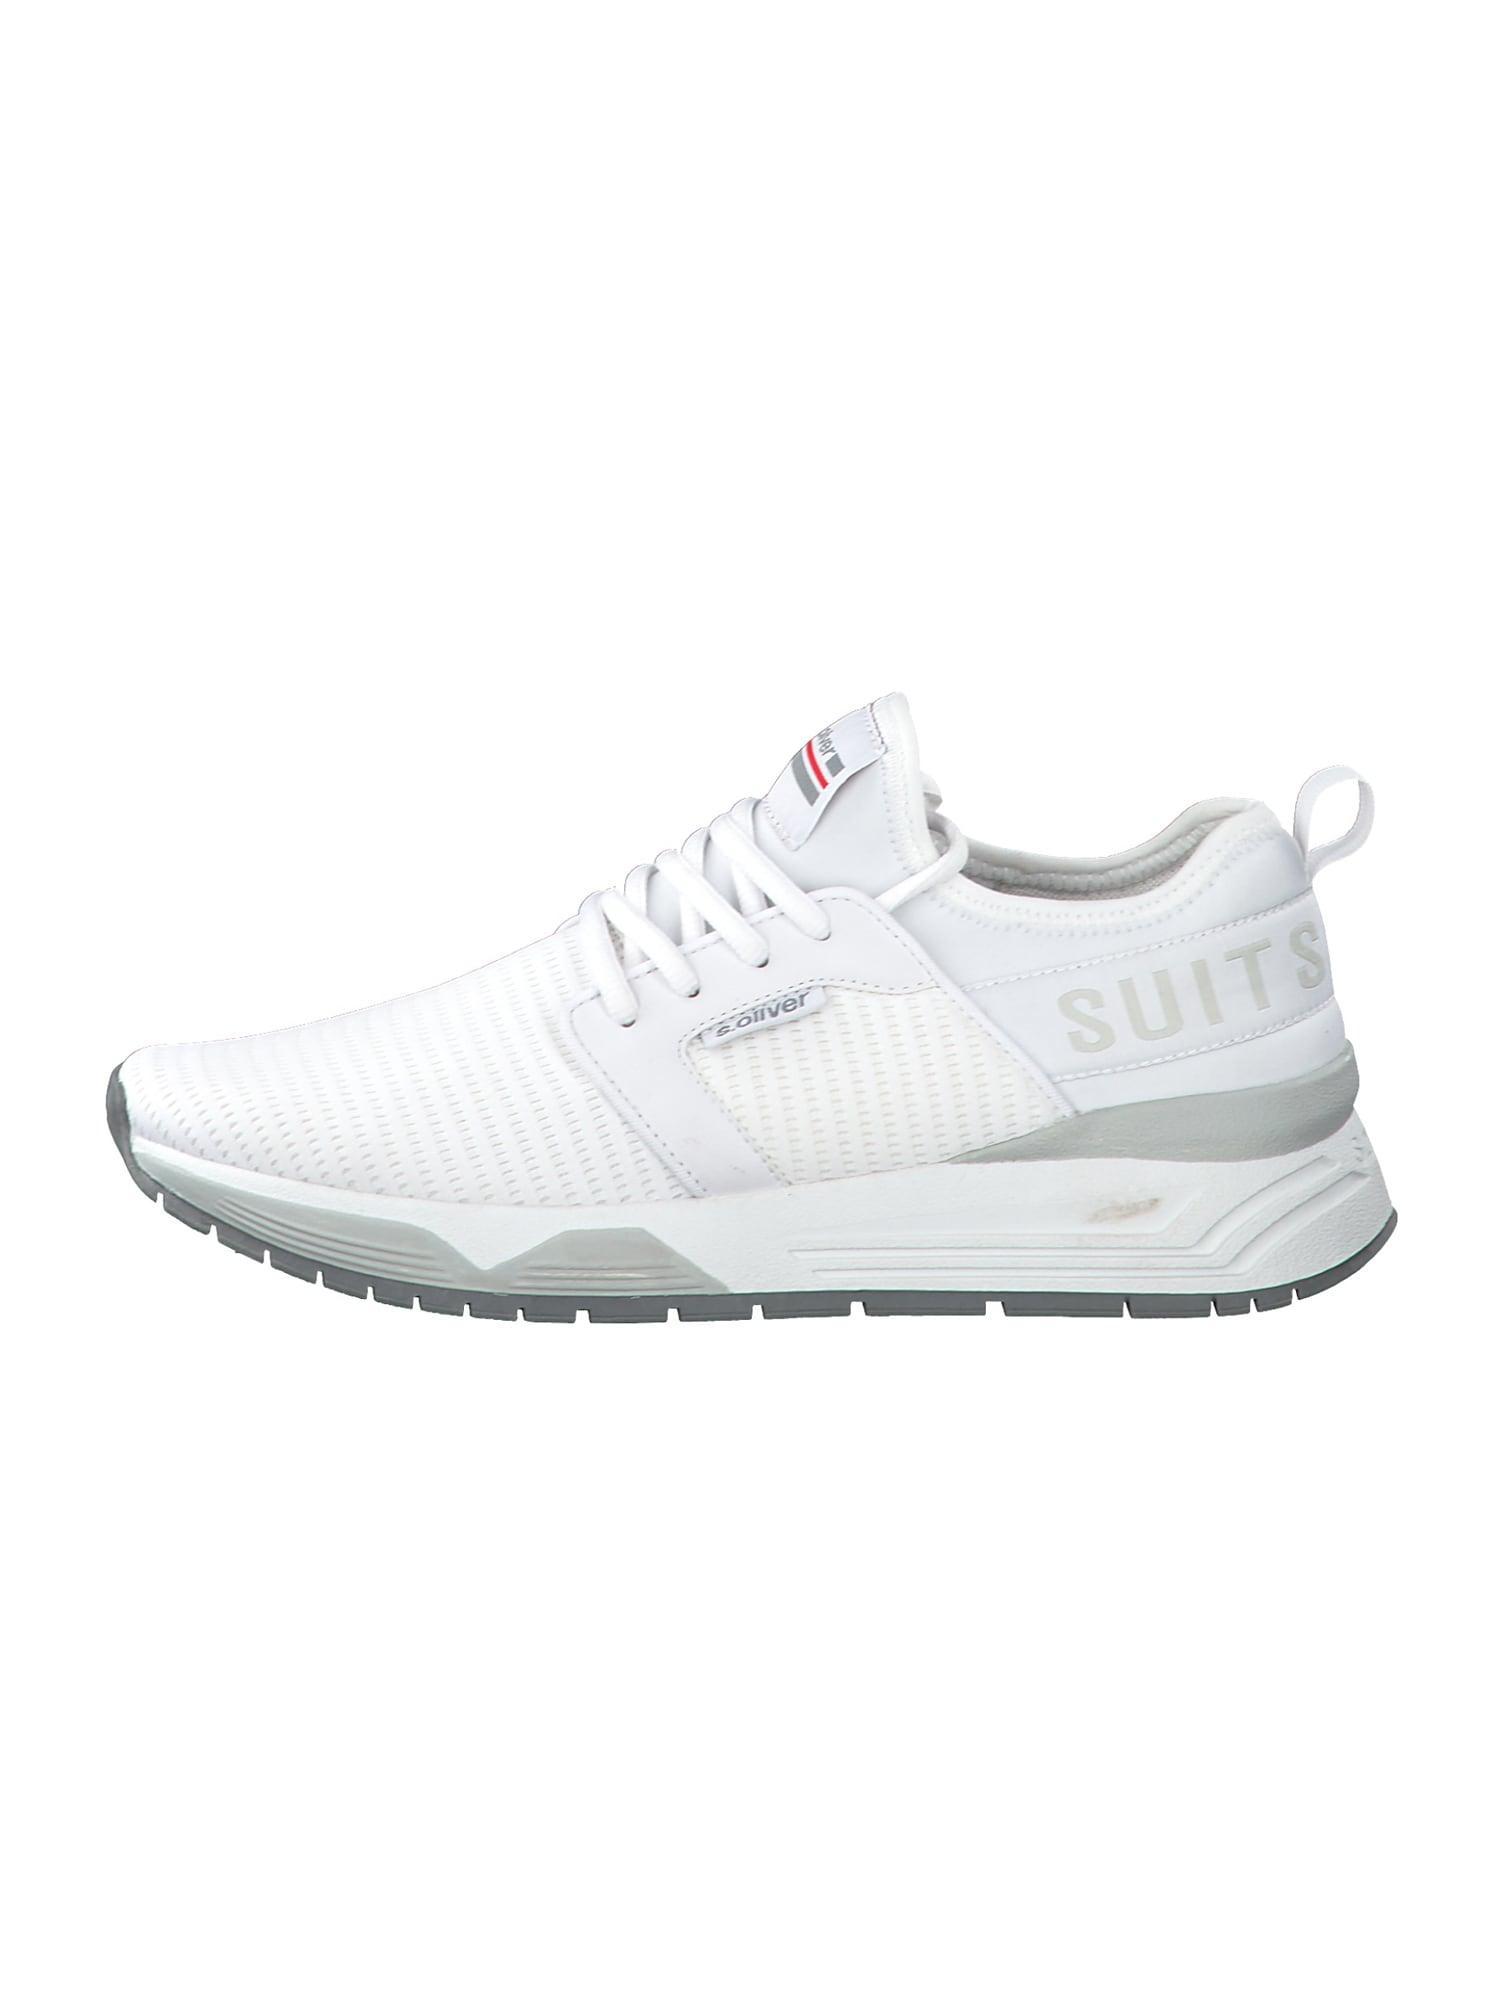 s.oliver - Sneaker